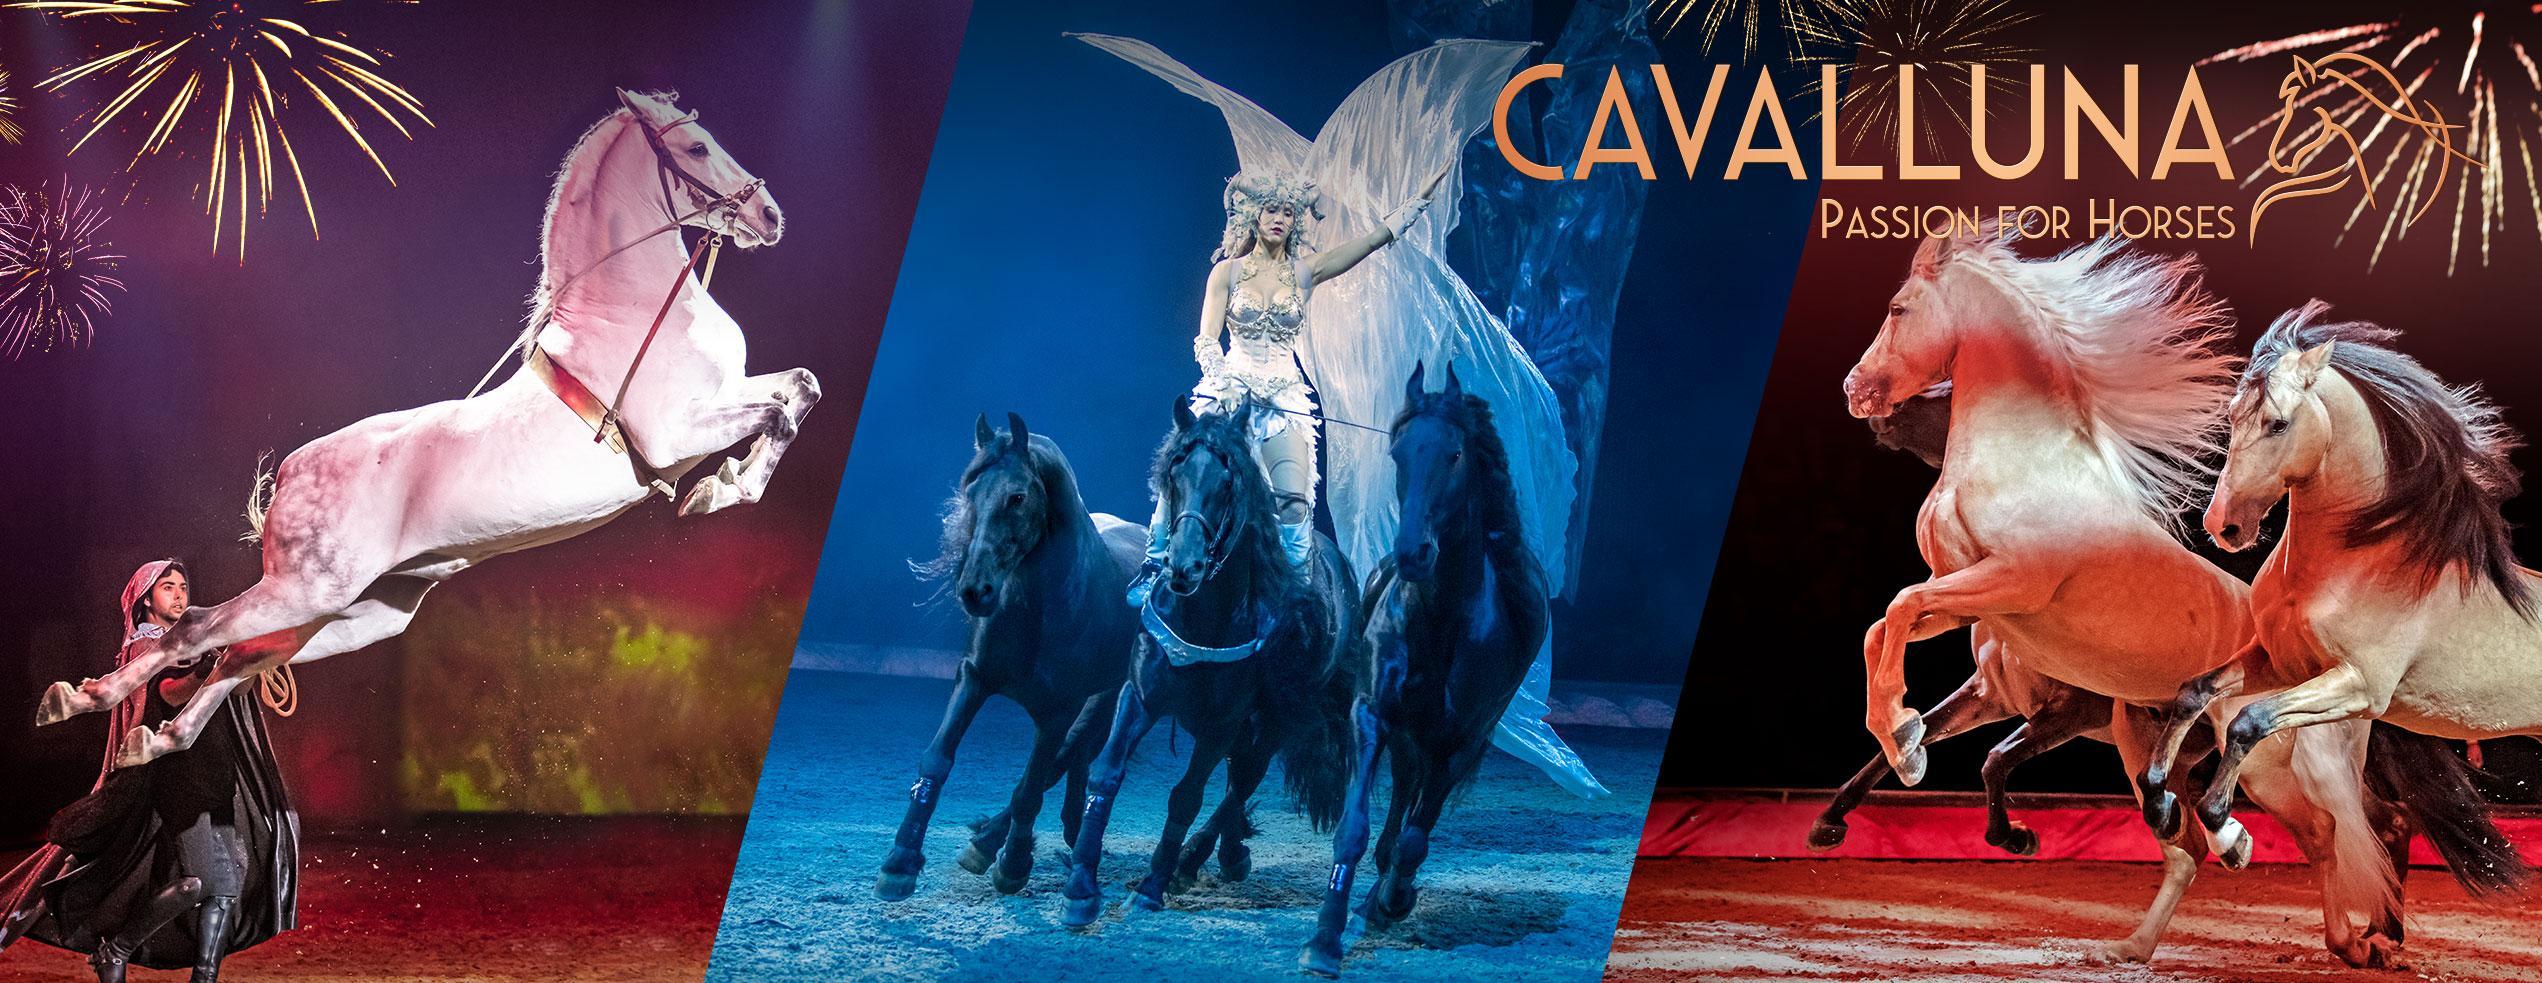 CAVALLUNA - Celebration